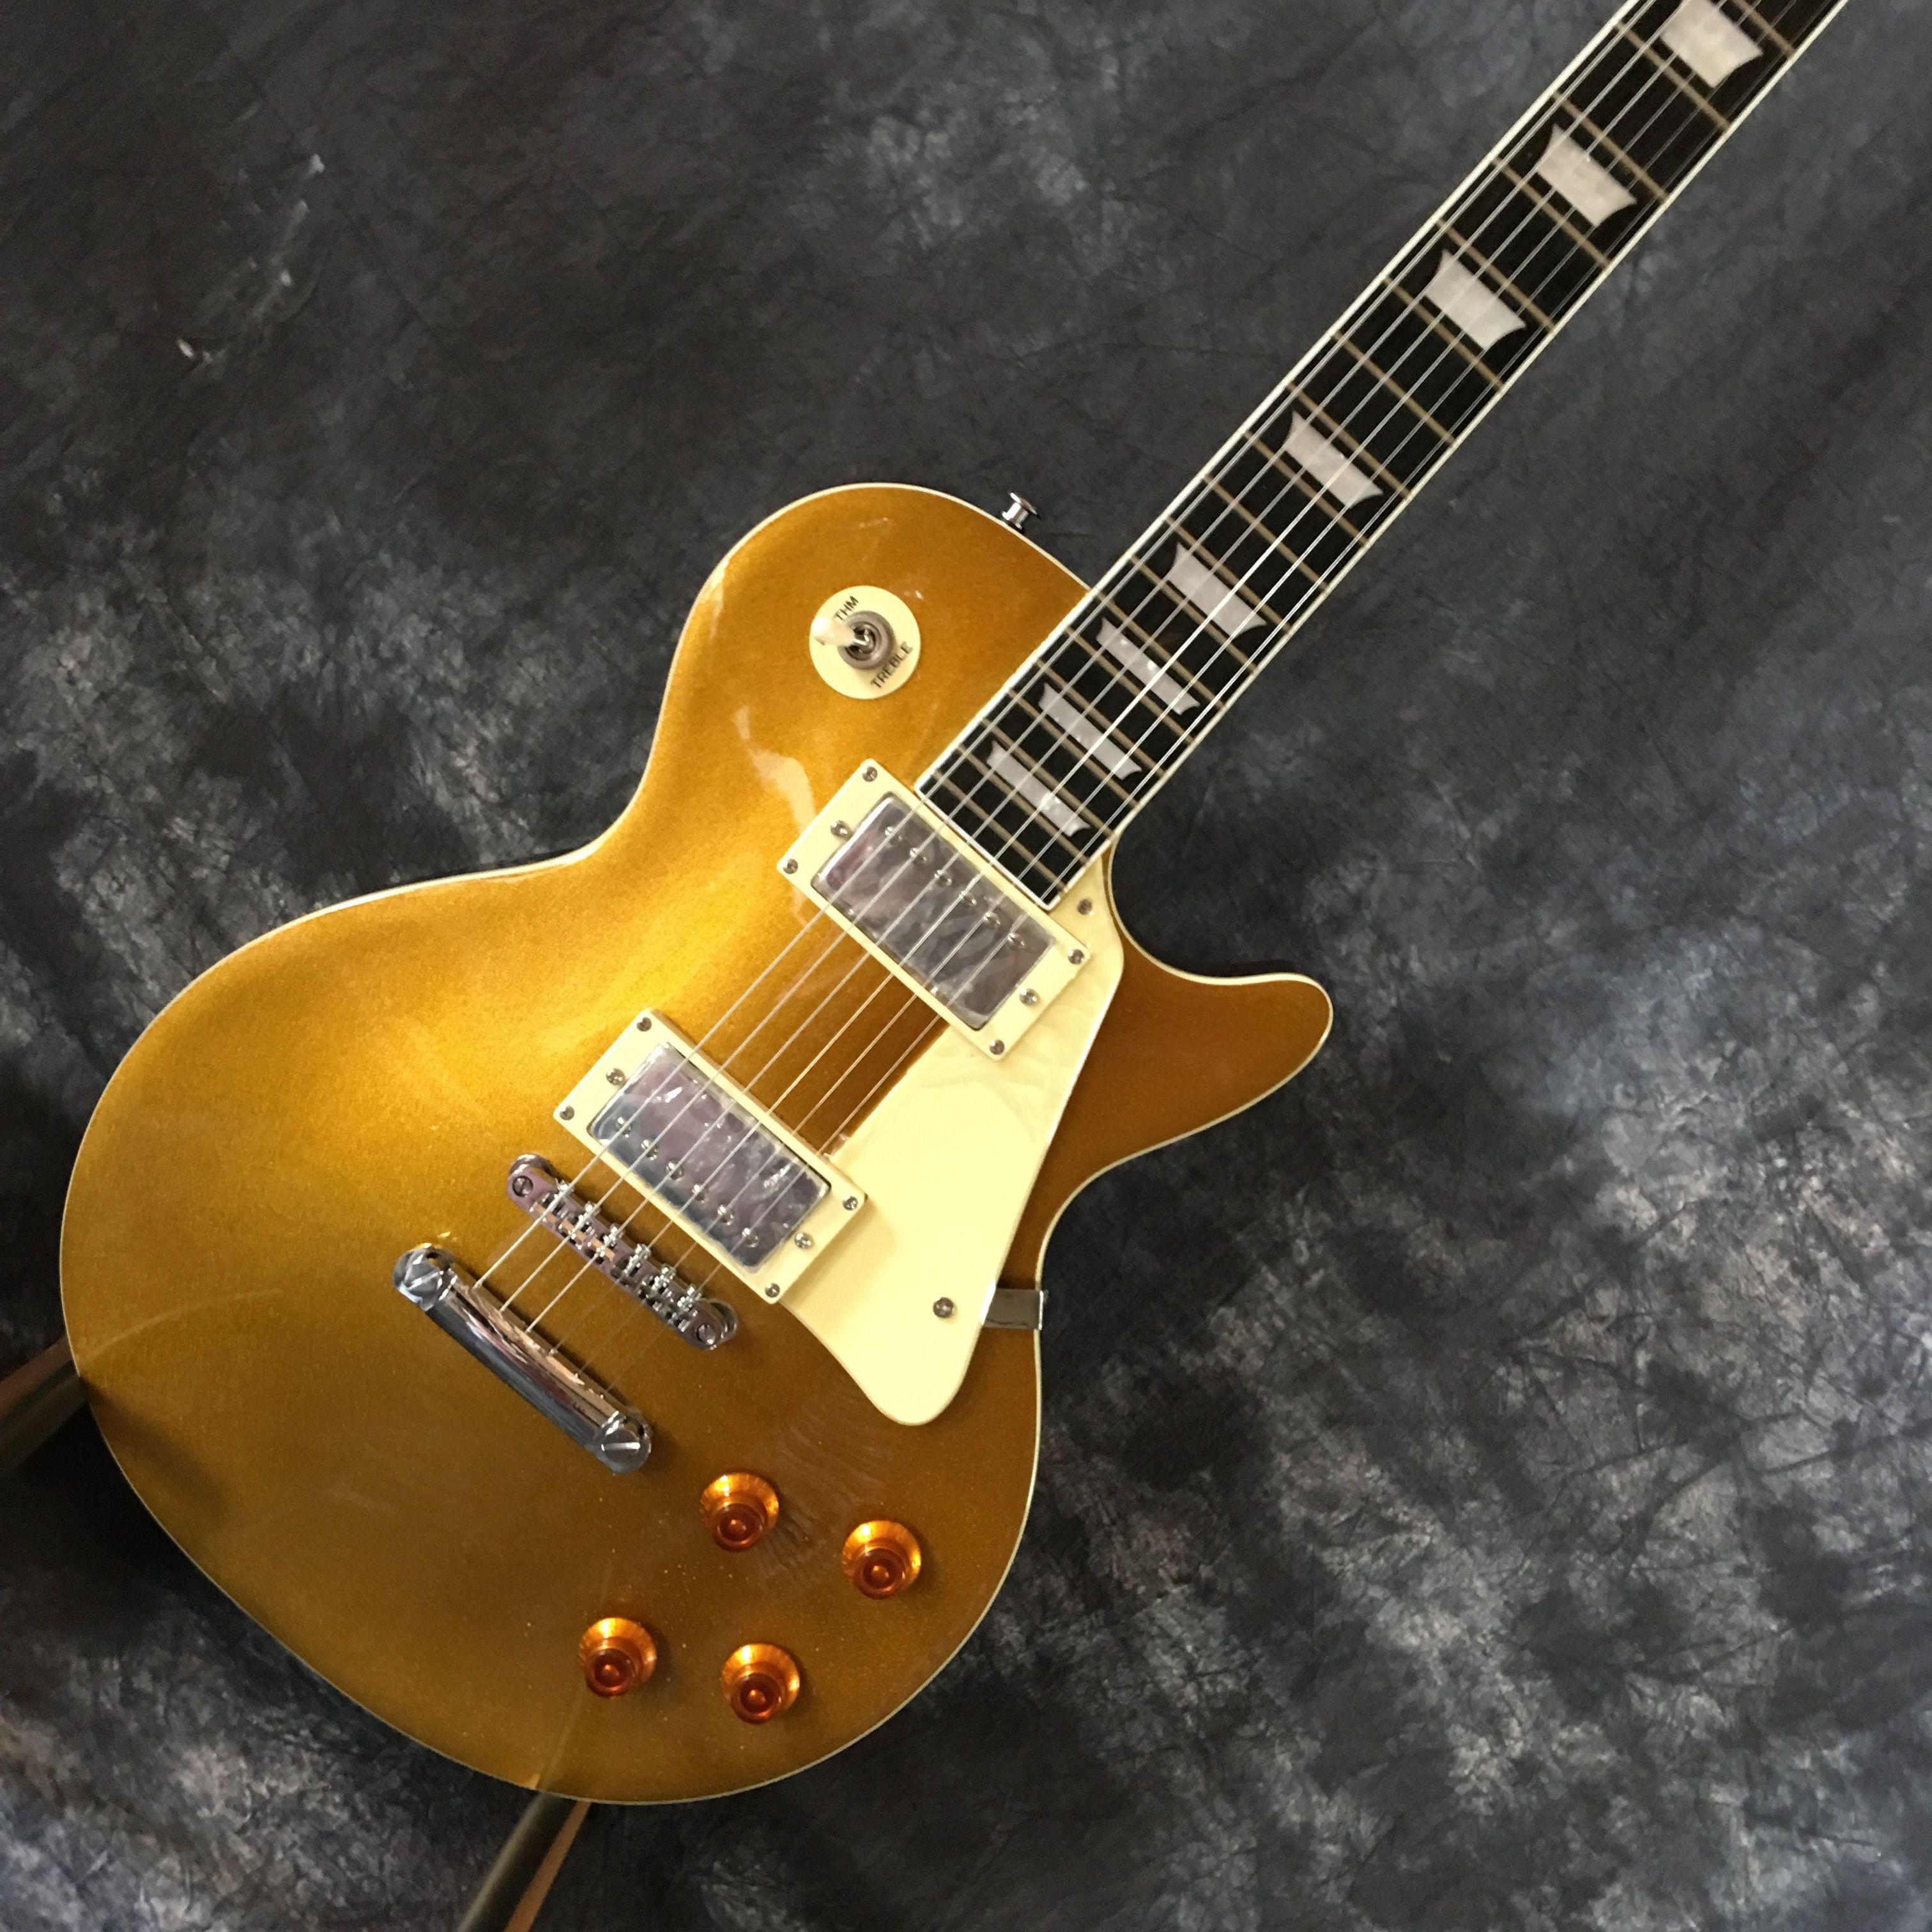 in stock 2018 manufacturer sales new best price wholesale lp custom shop gold electric guitar. Black Bedroom Furniture Sets. Home Design Ideas